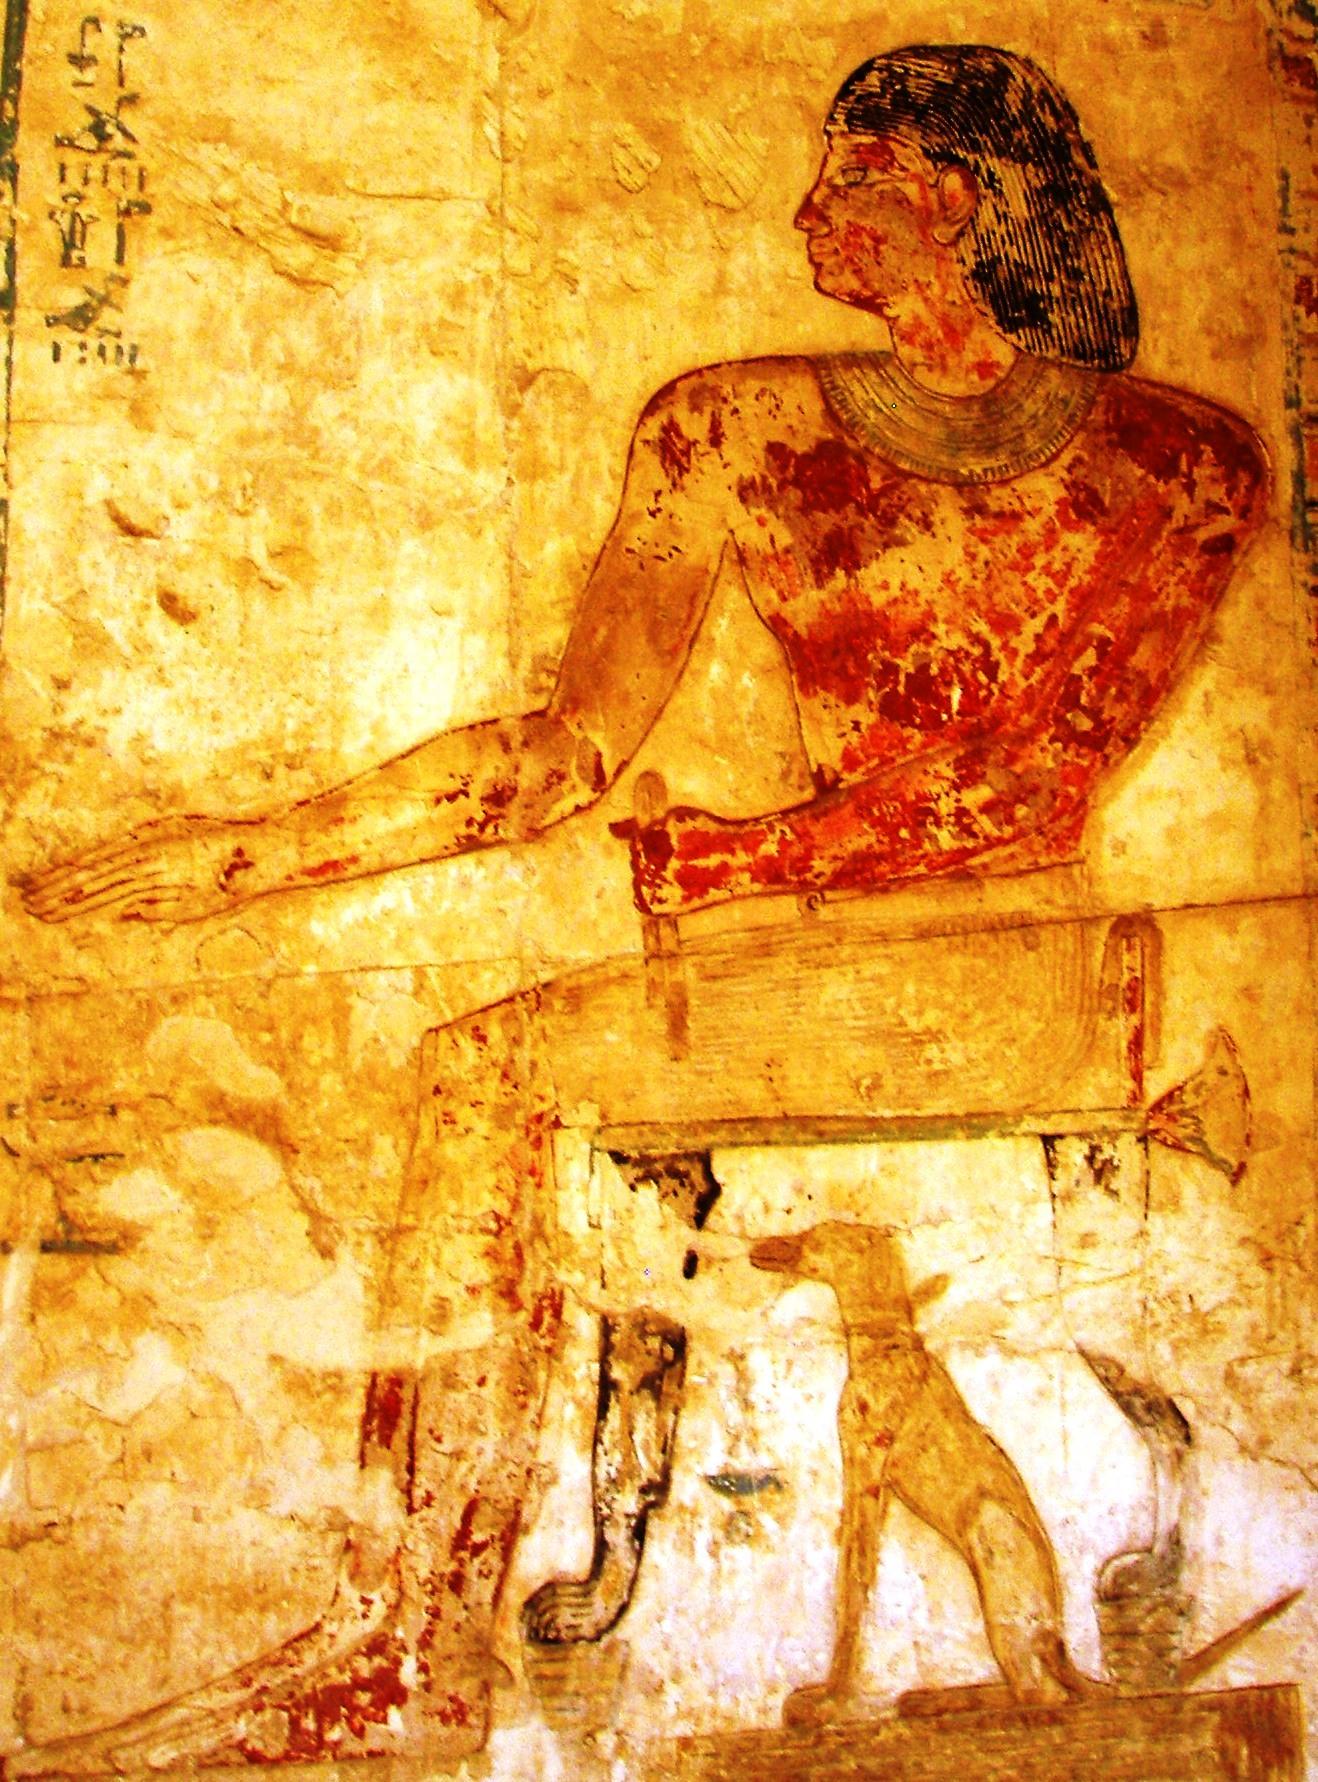 Dogilike.com :: เรื่องเล่าจากอดีต EP1 ... สุนัขกับความเชื่อของคนในยุคอียิปต์โบราณ